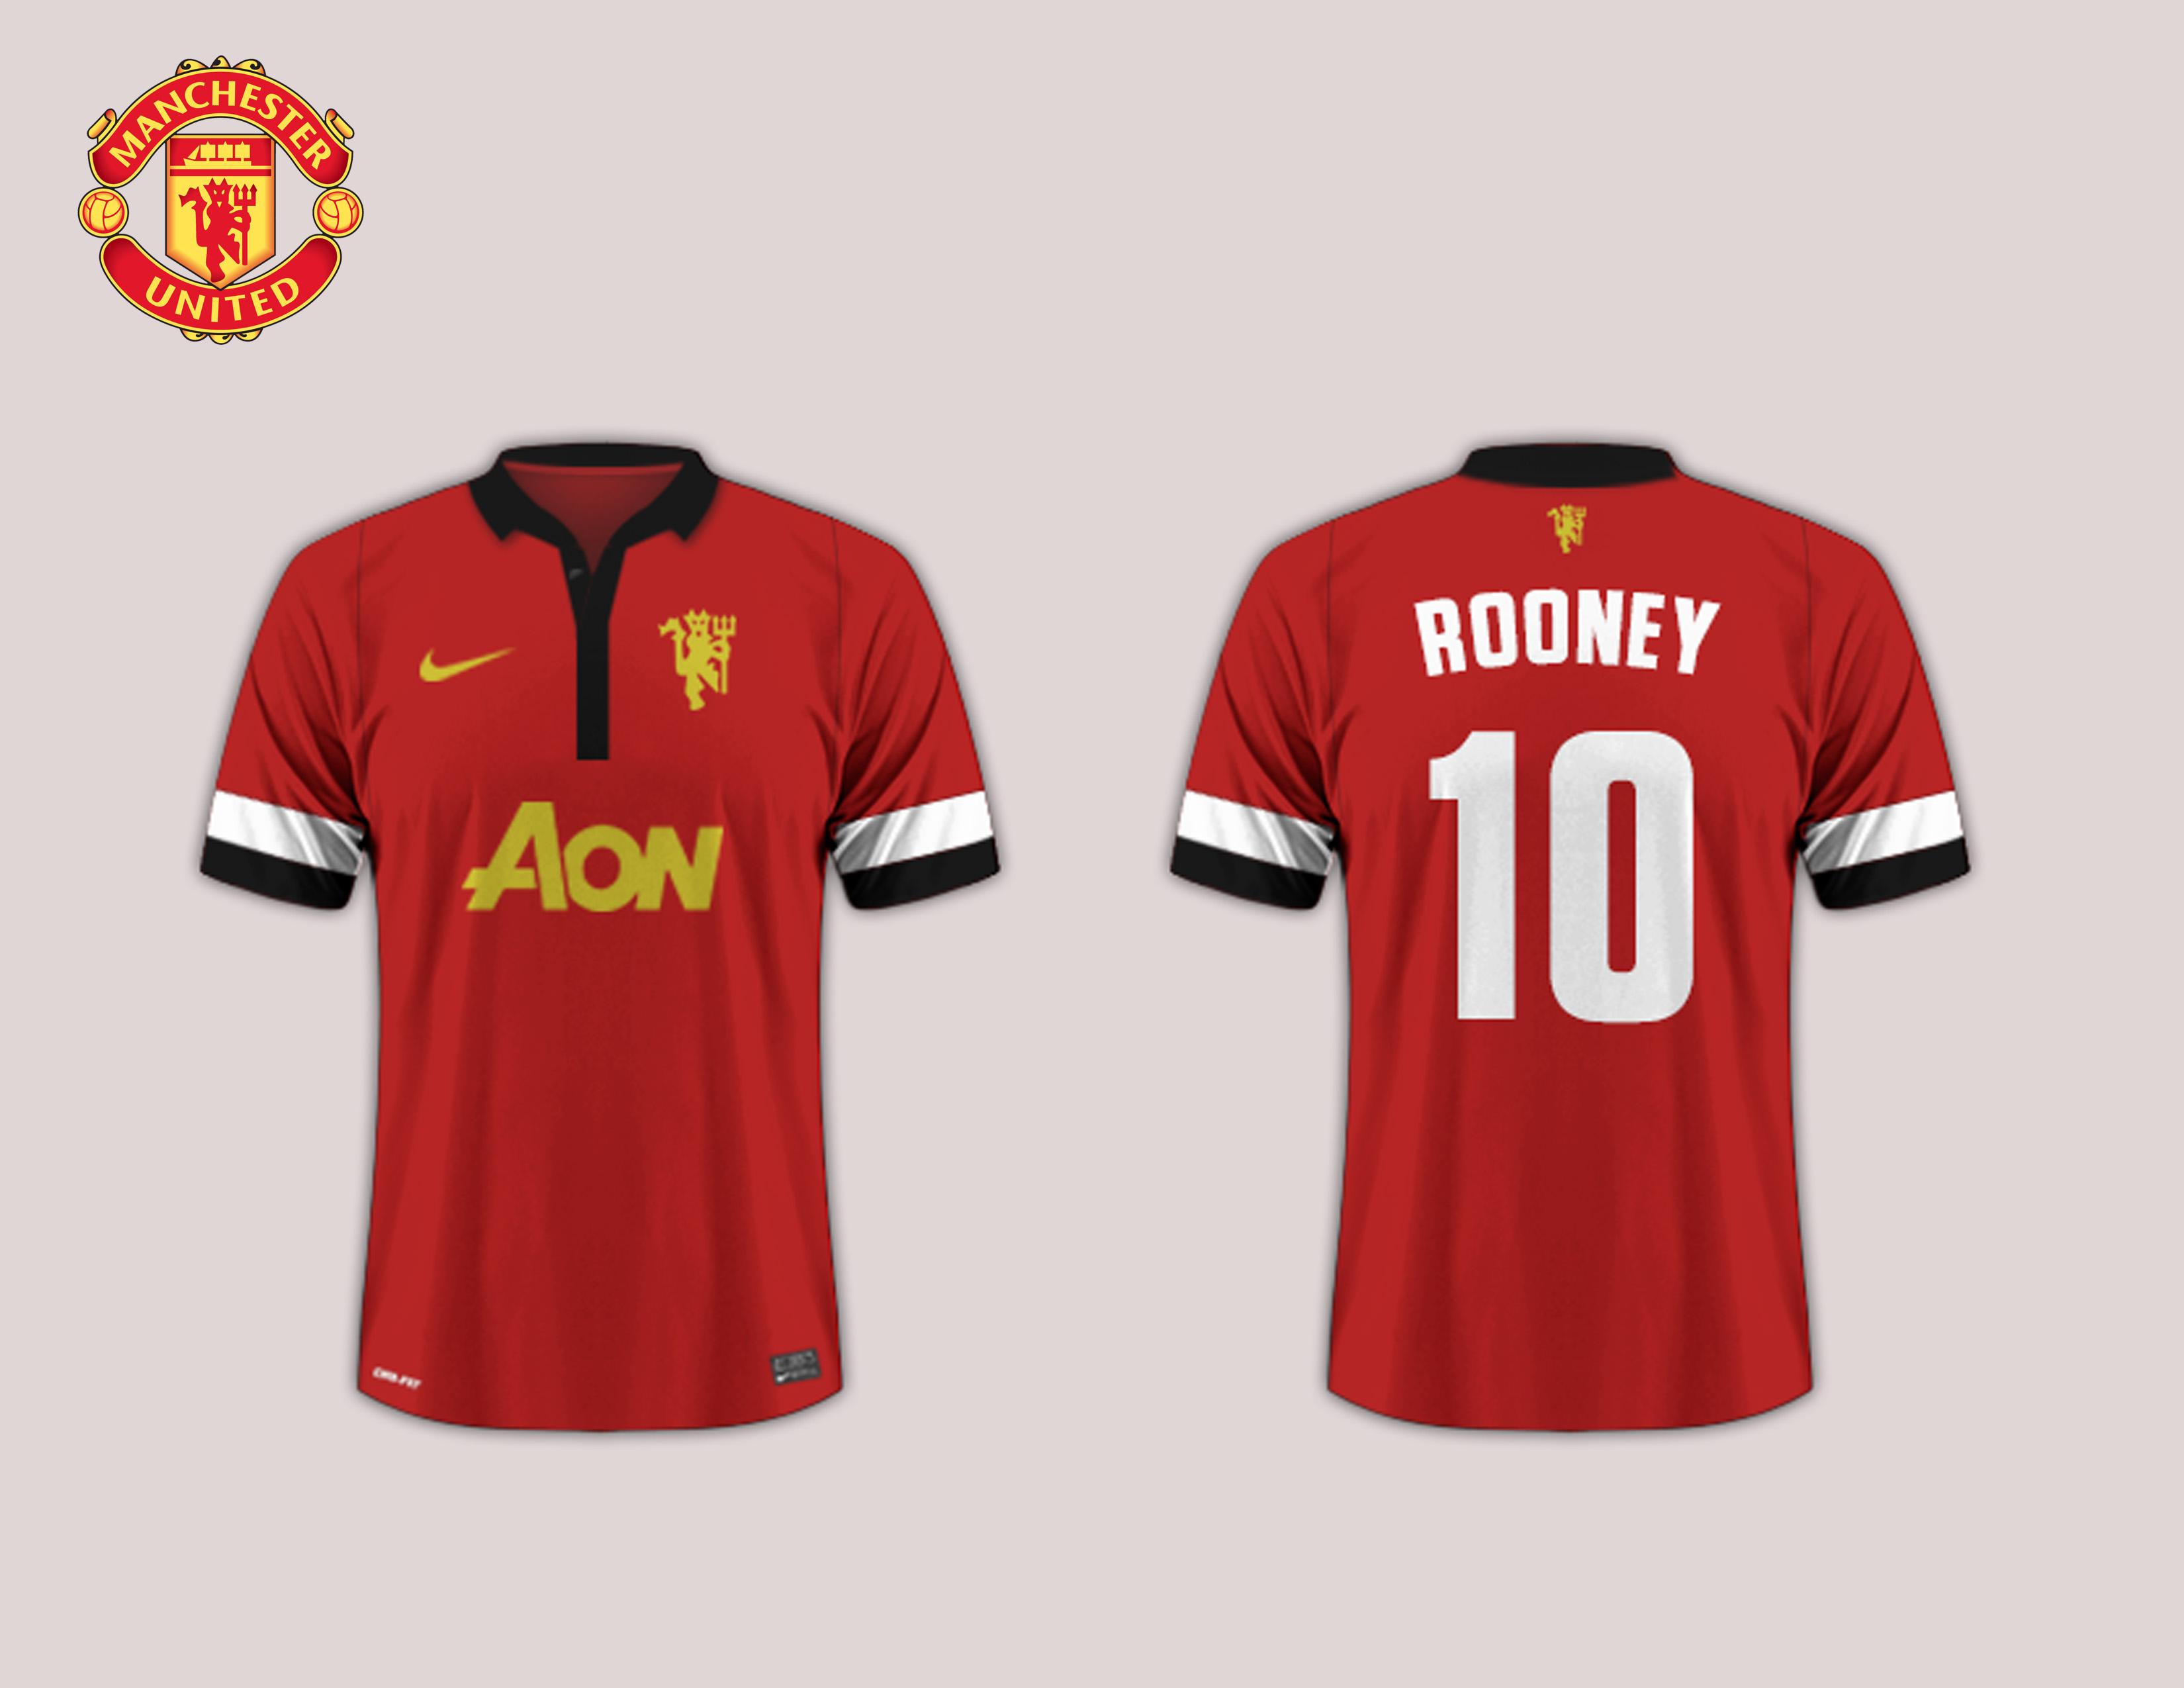 online store 006b9 16ed6 Home Kit // Manchester United